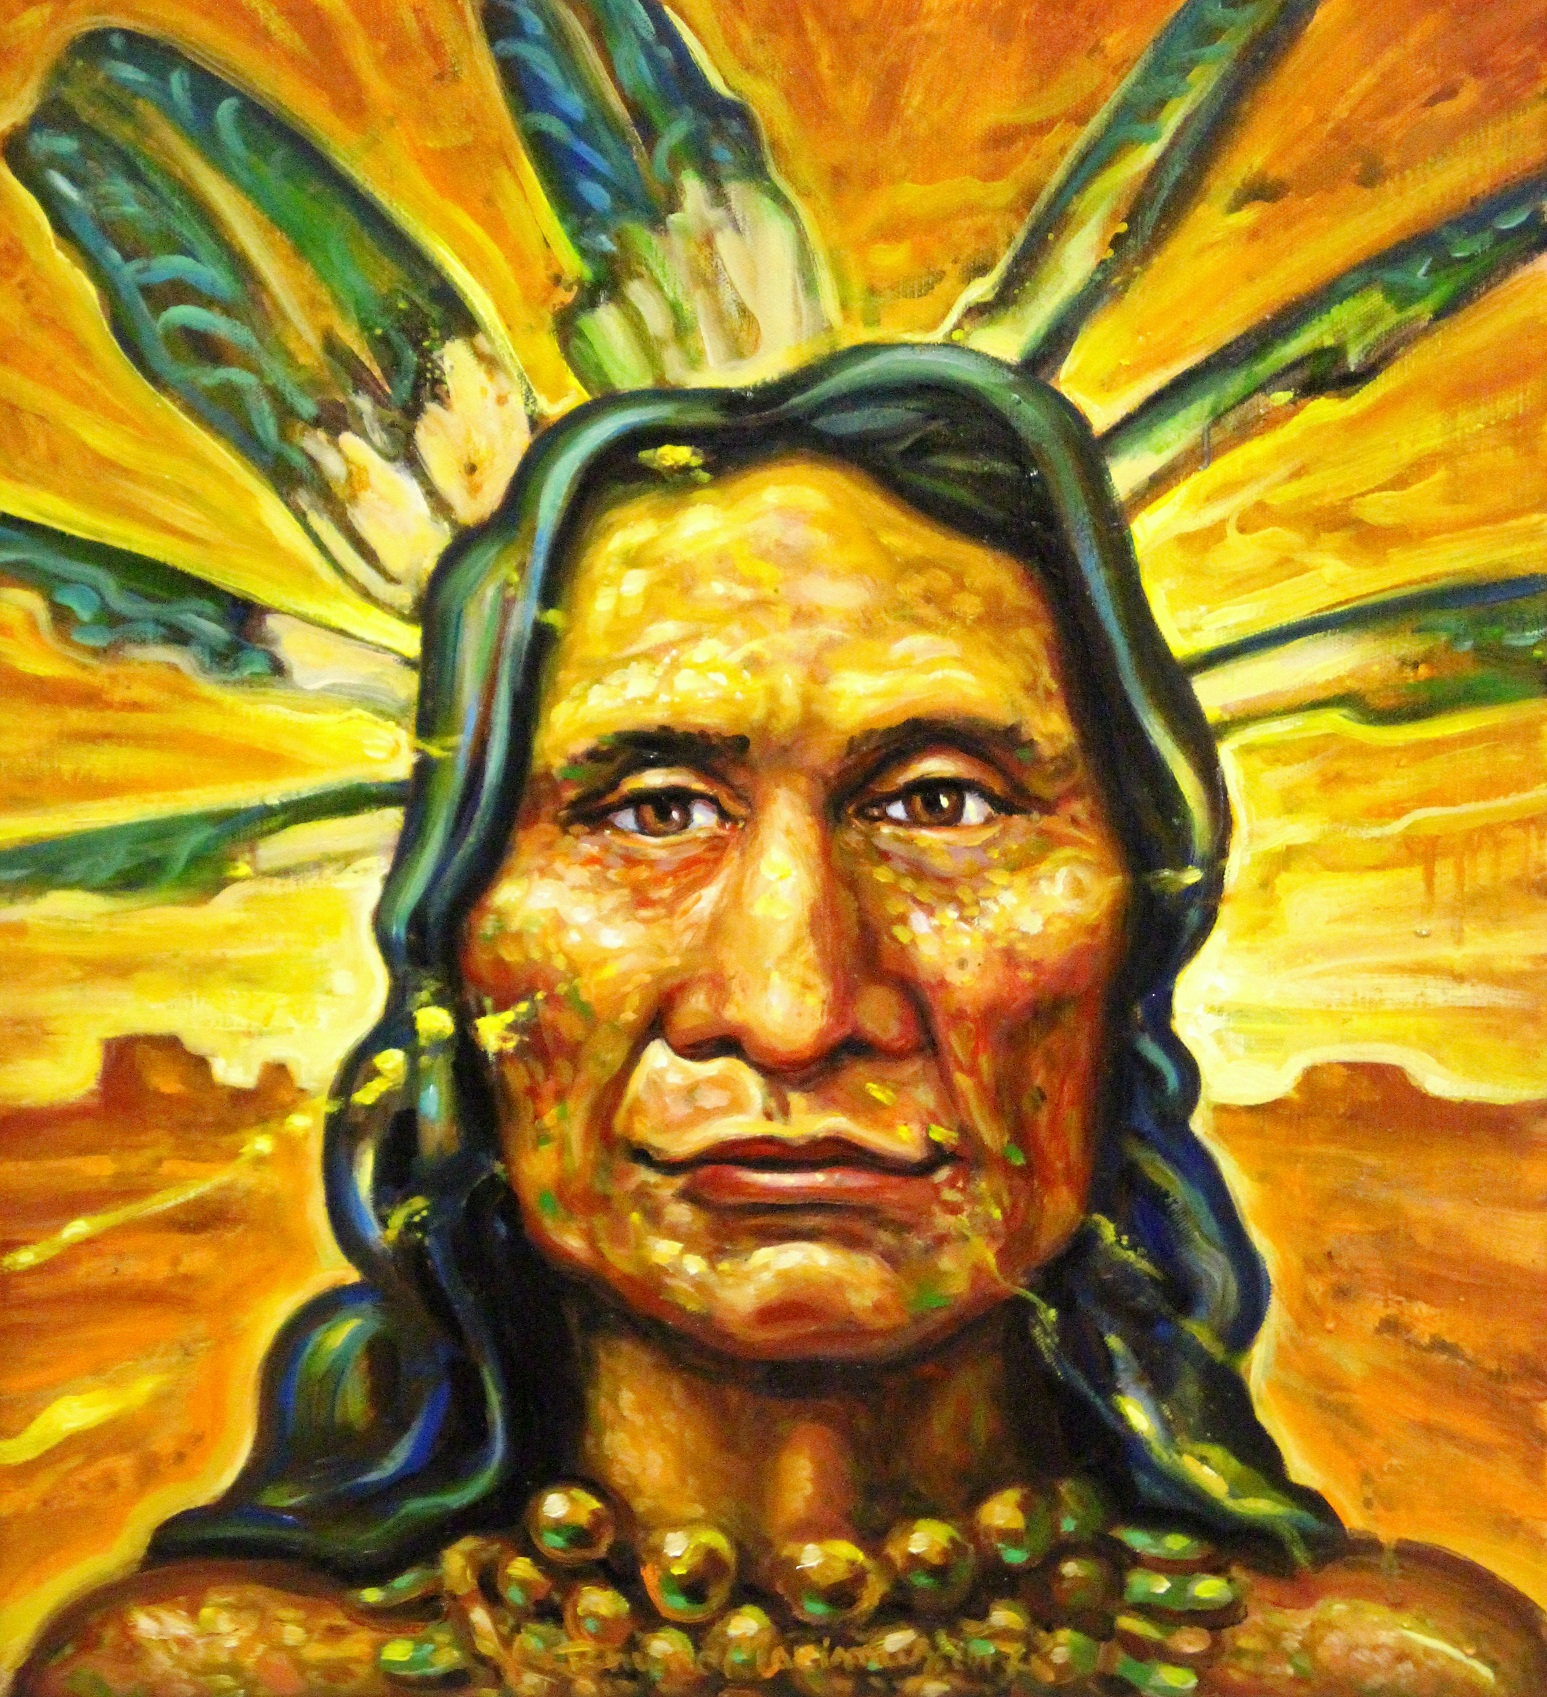 American Native, 2017